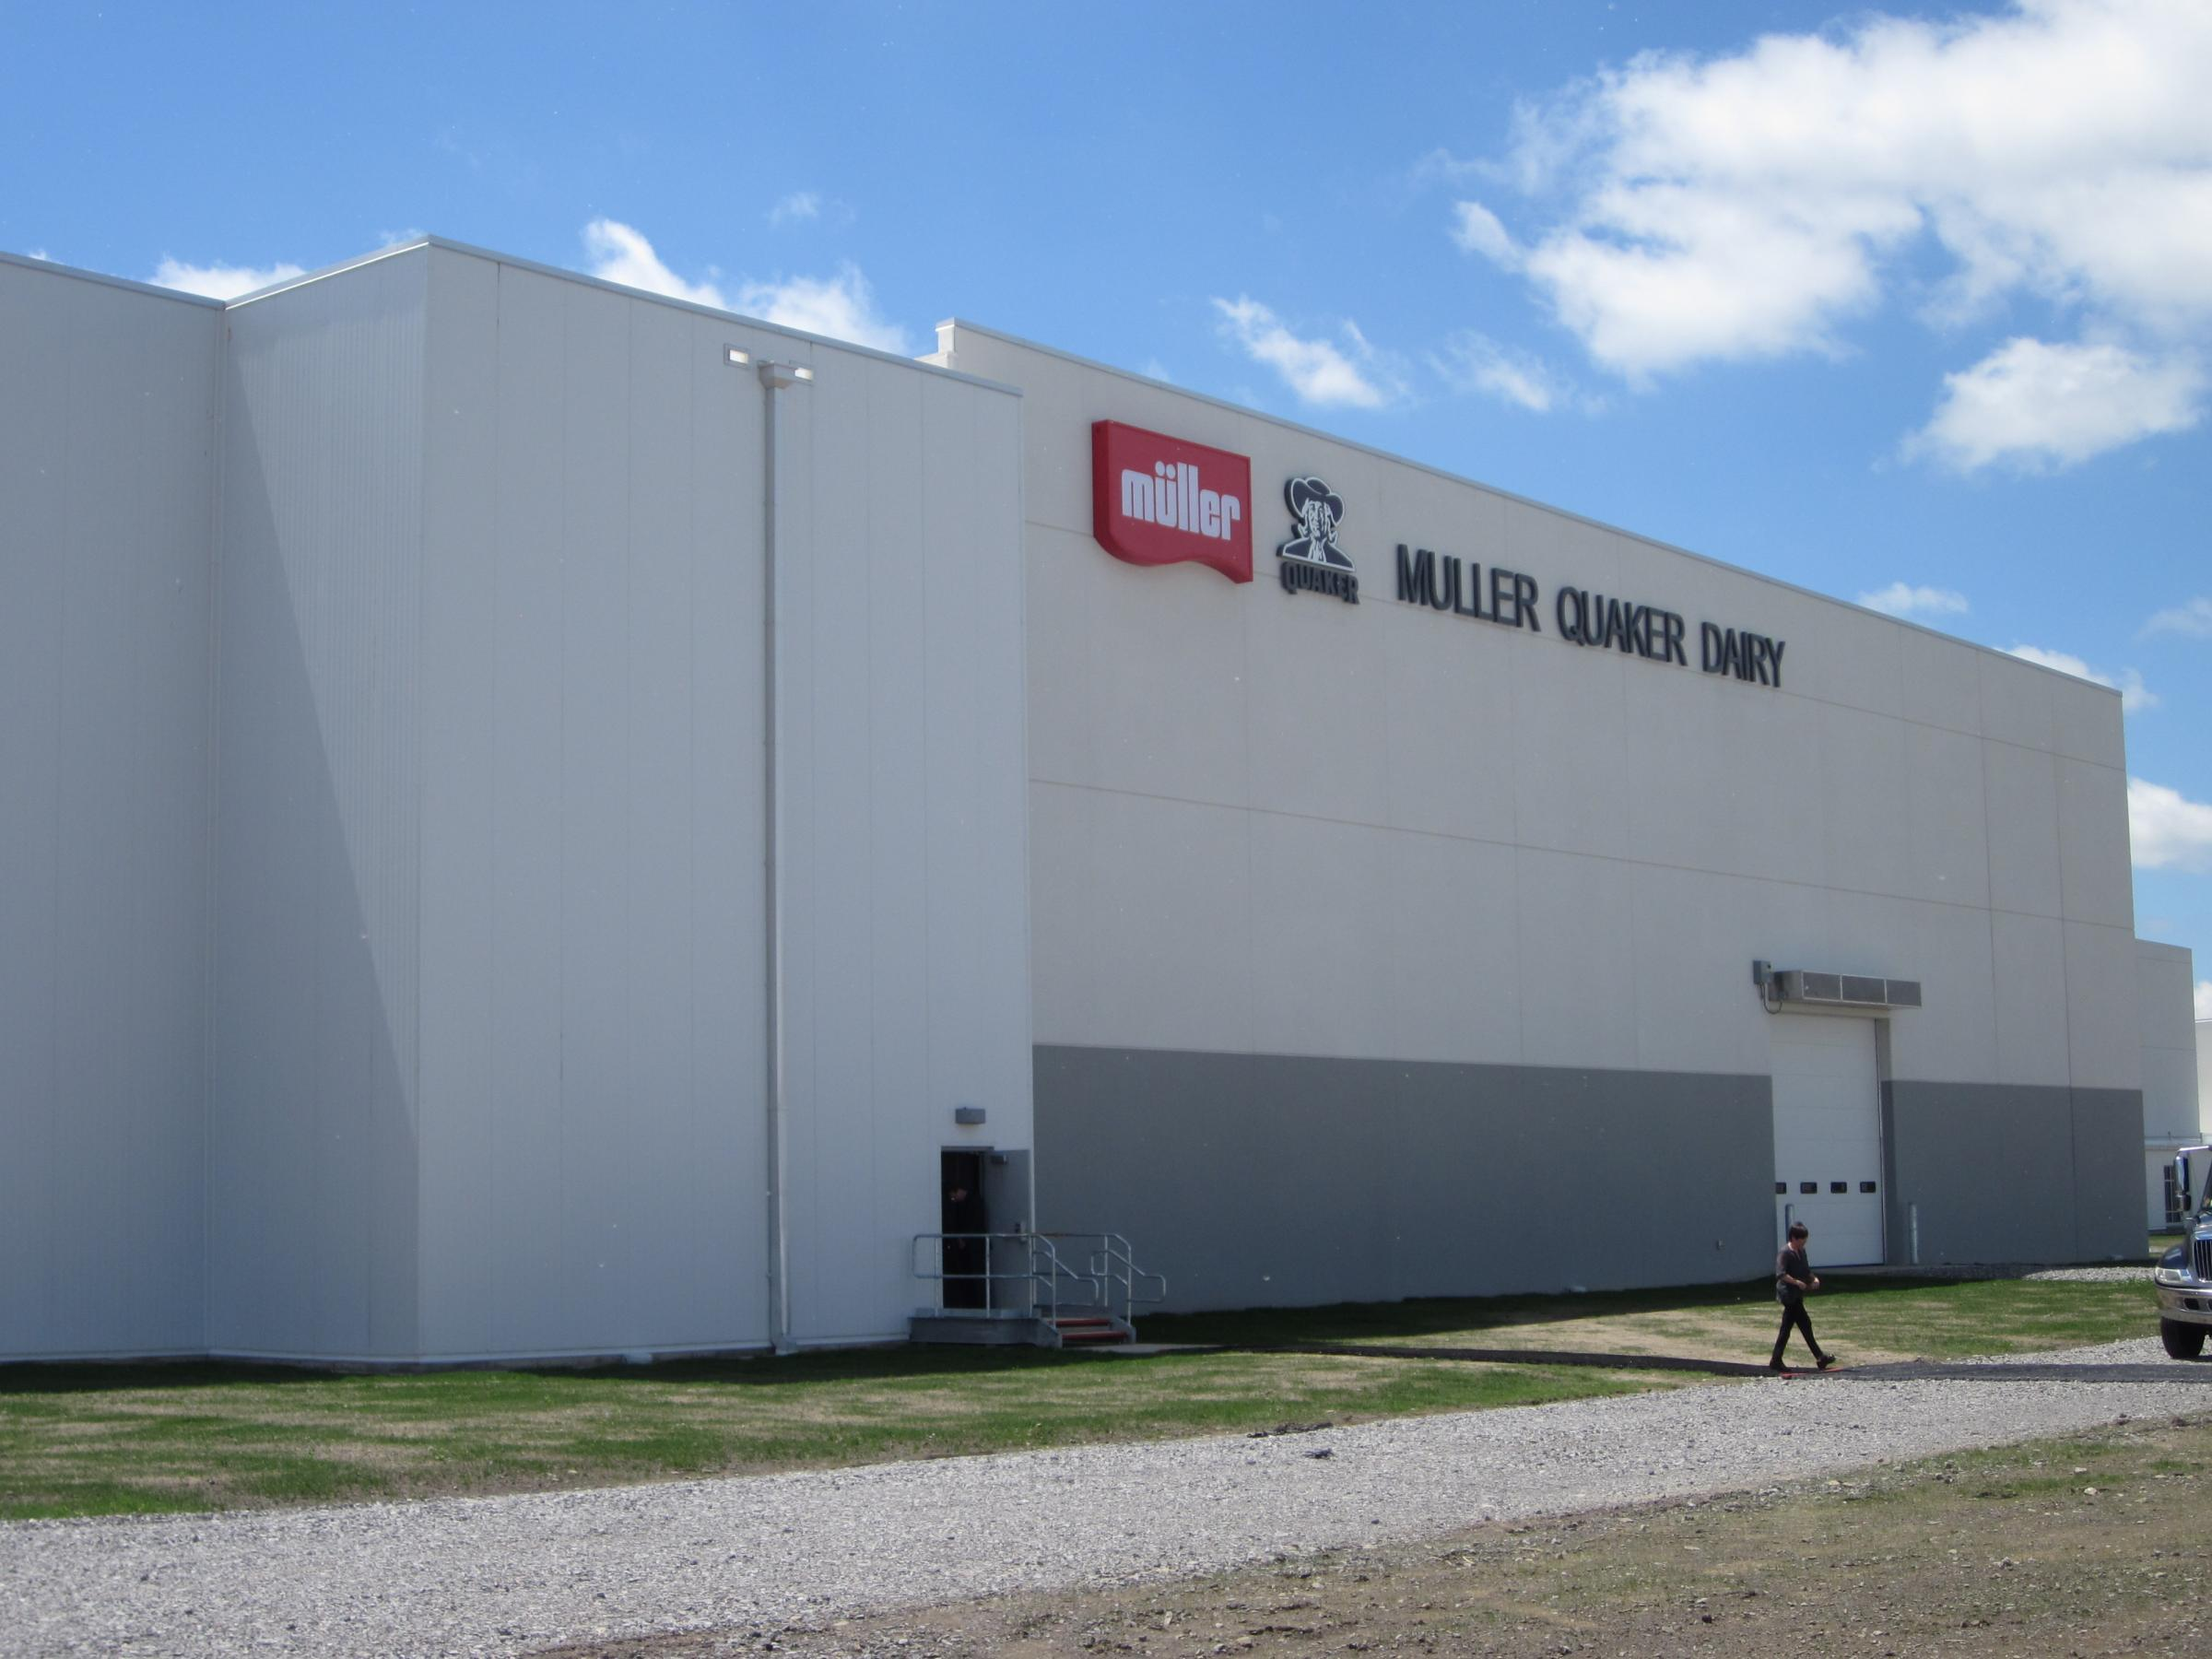 PepsiCo, Muller agree to close upstate NY yogurt plant